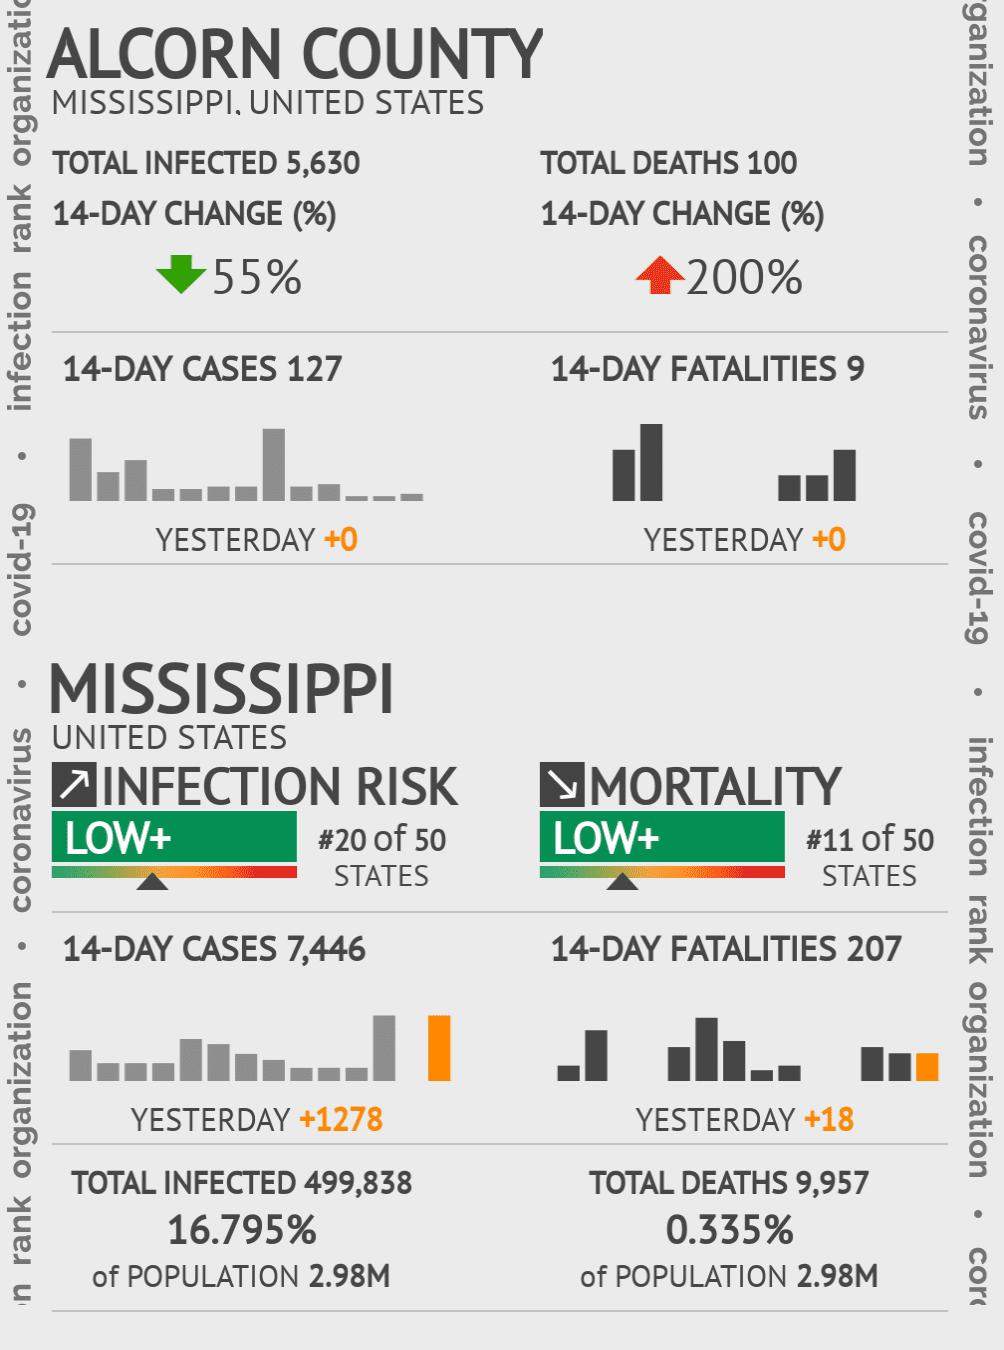 Alcorn County Coronavirus Covid-19 Risk of Infection on July 24, 2021